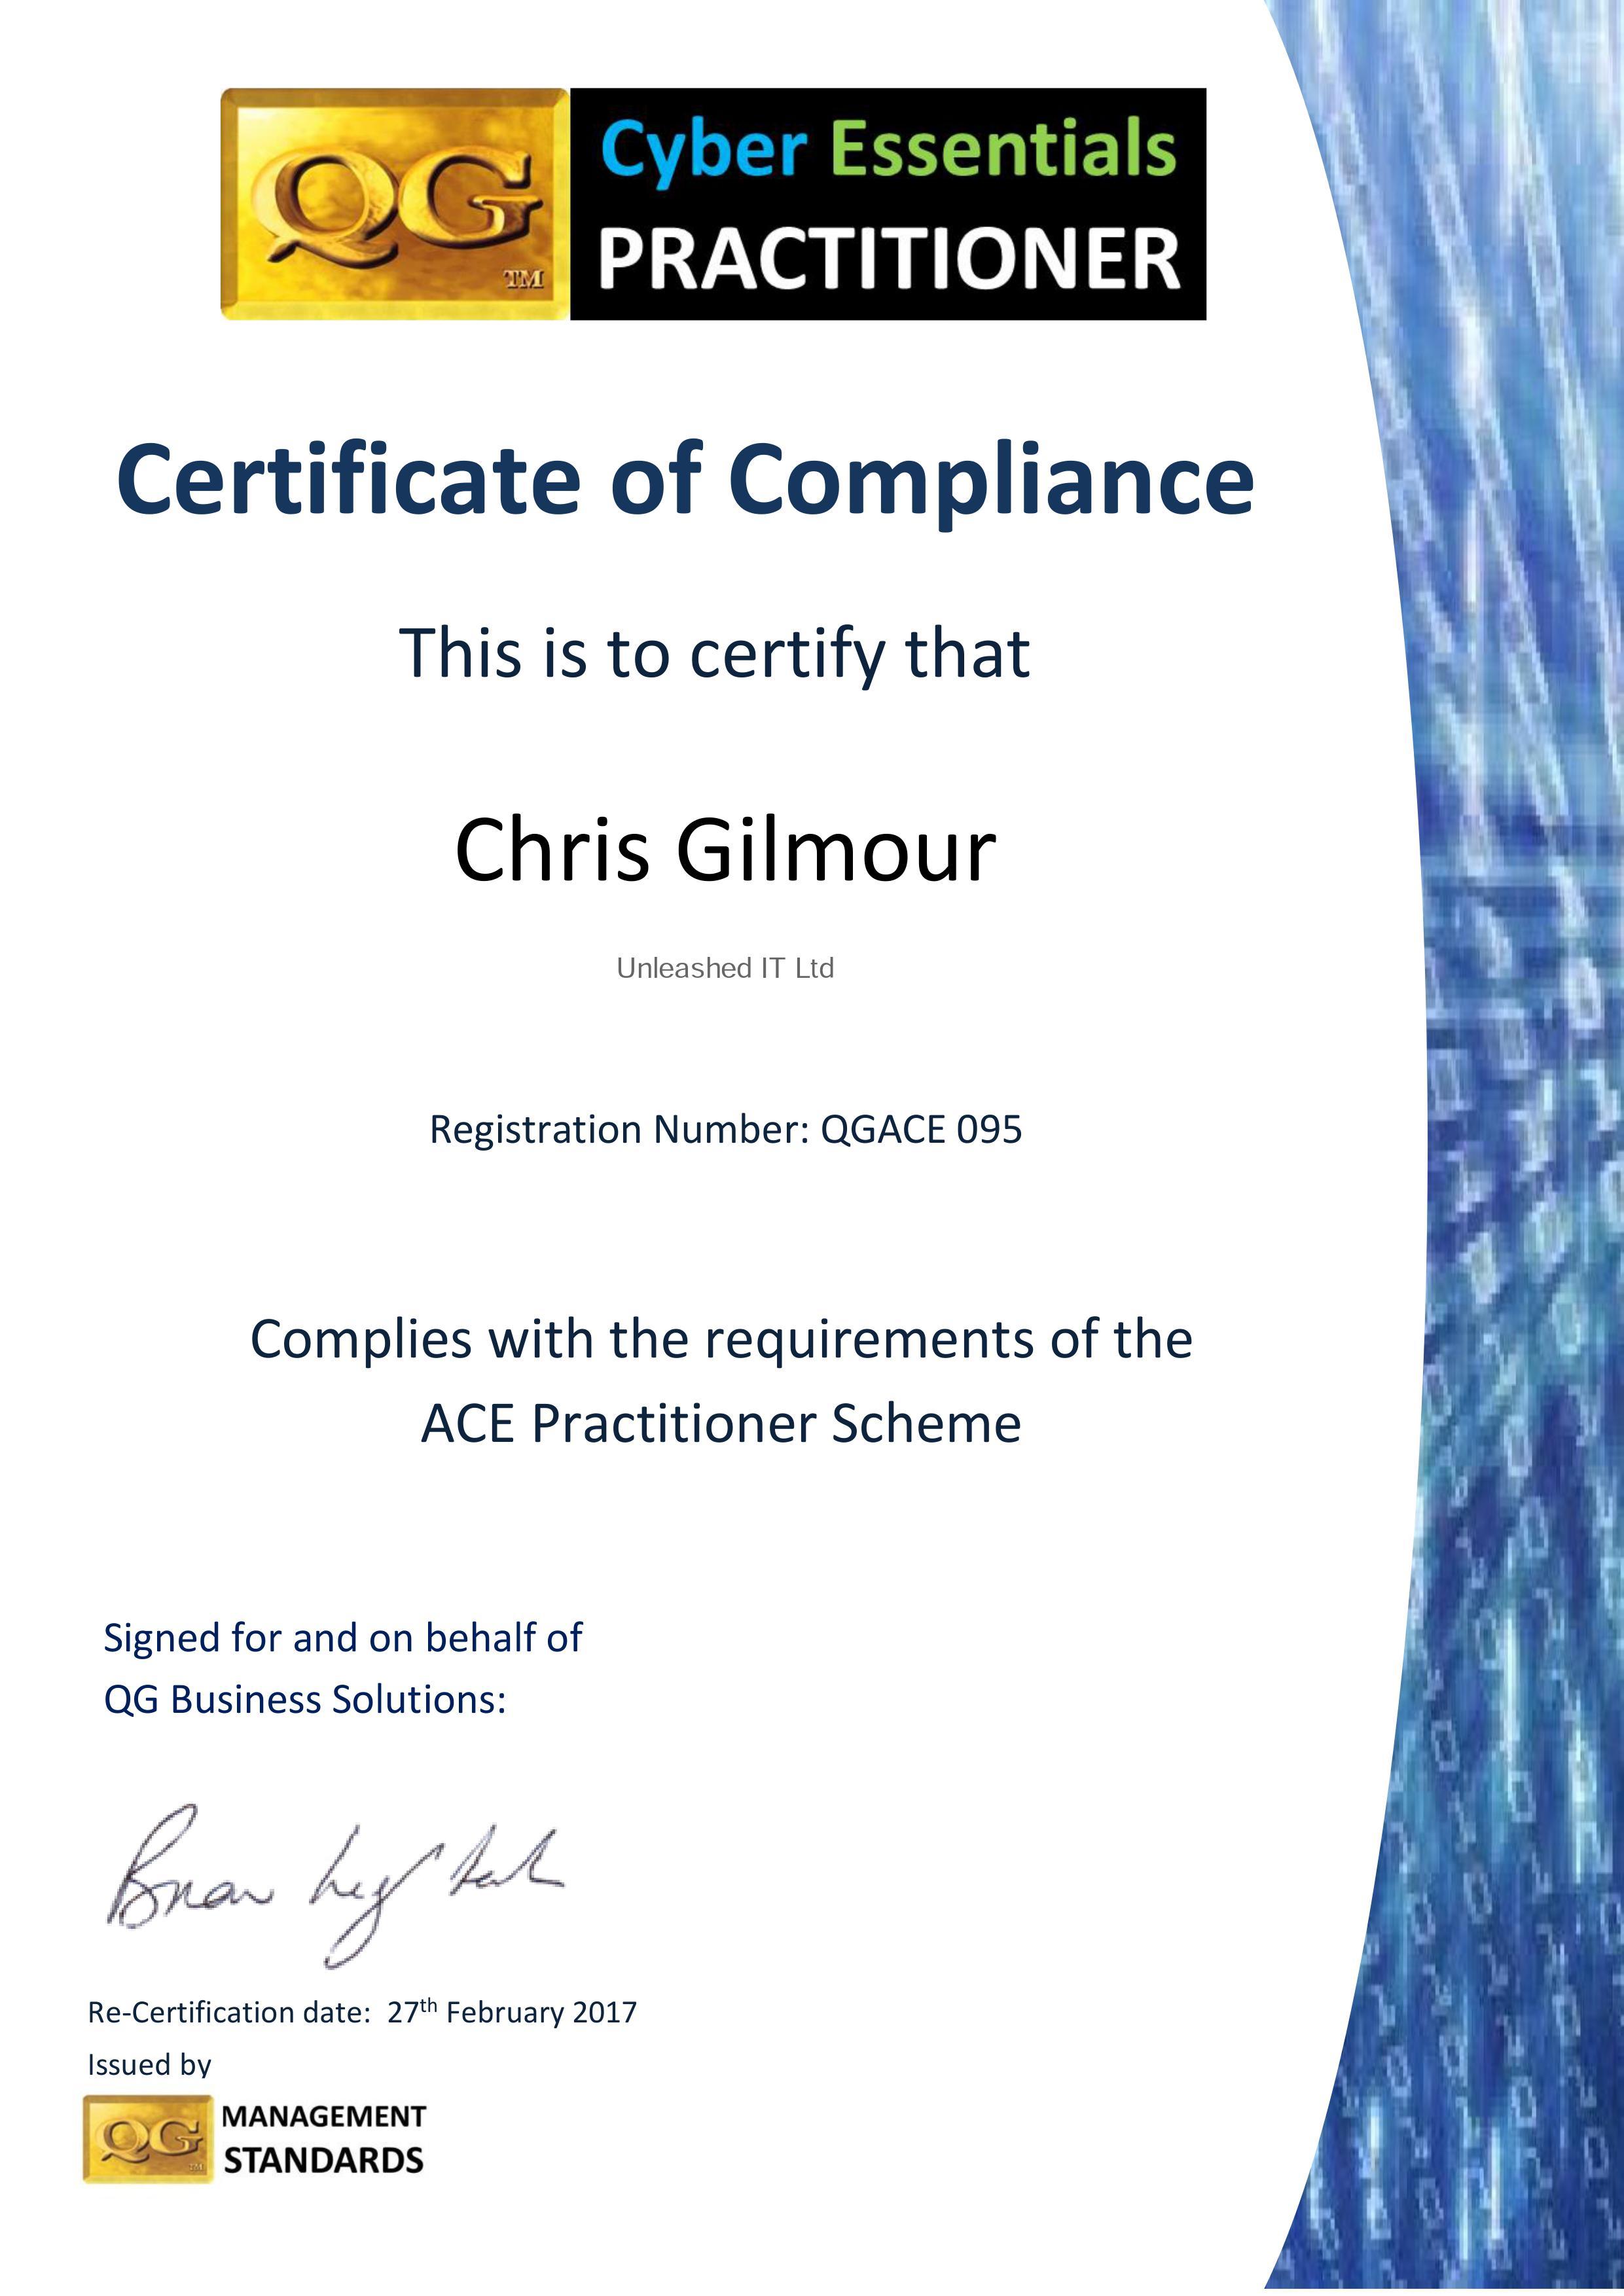 QGCE095 15 16 cert Chris Gilmore